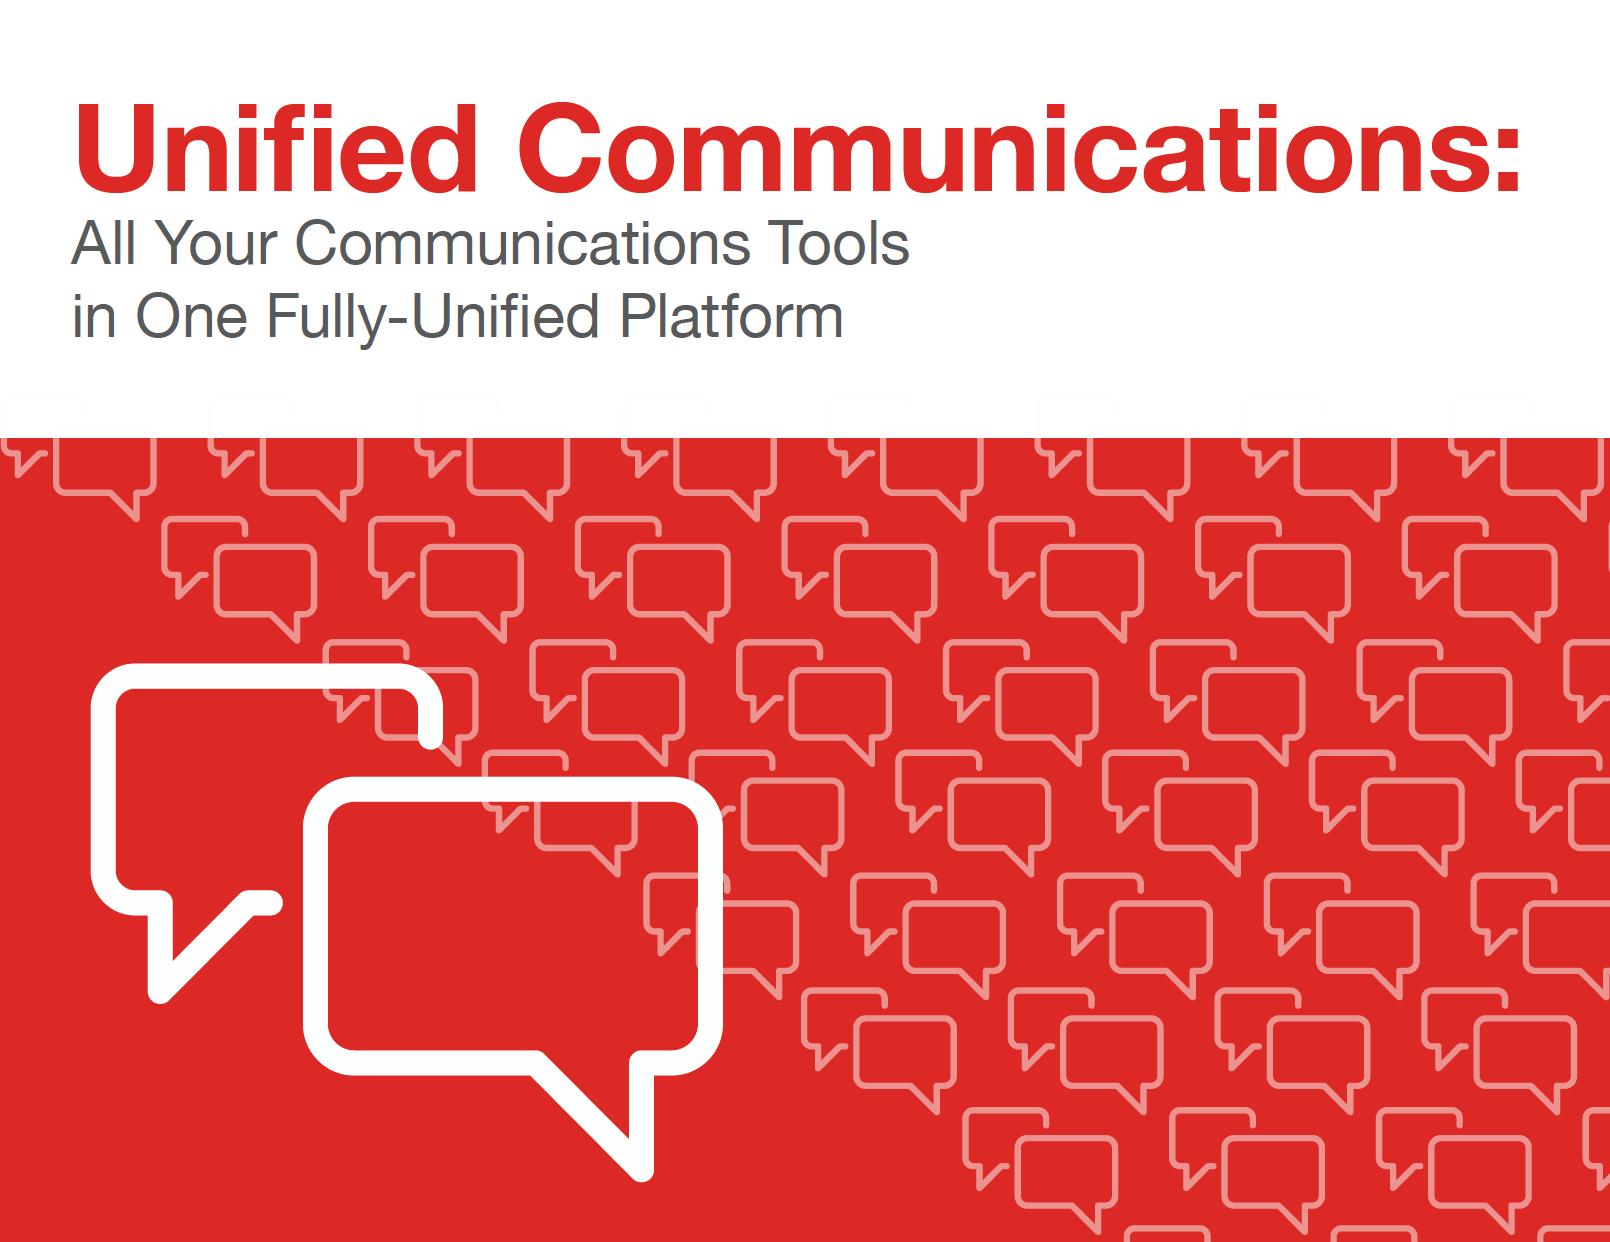 Unified Communications Ebook Cover Loffler Companies